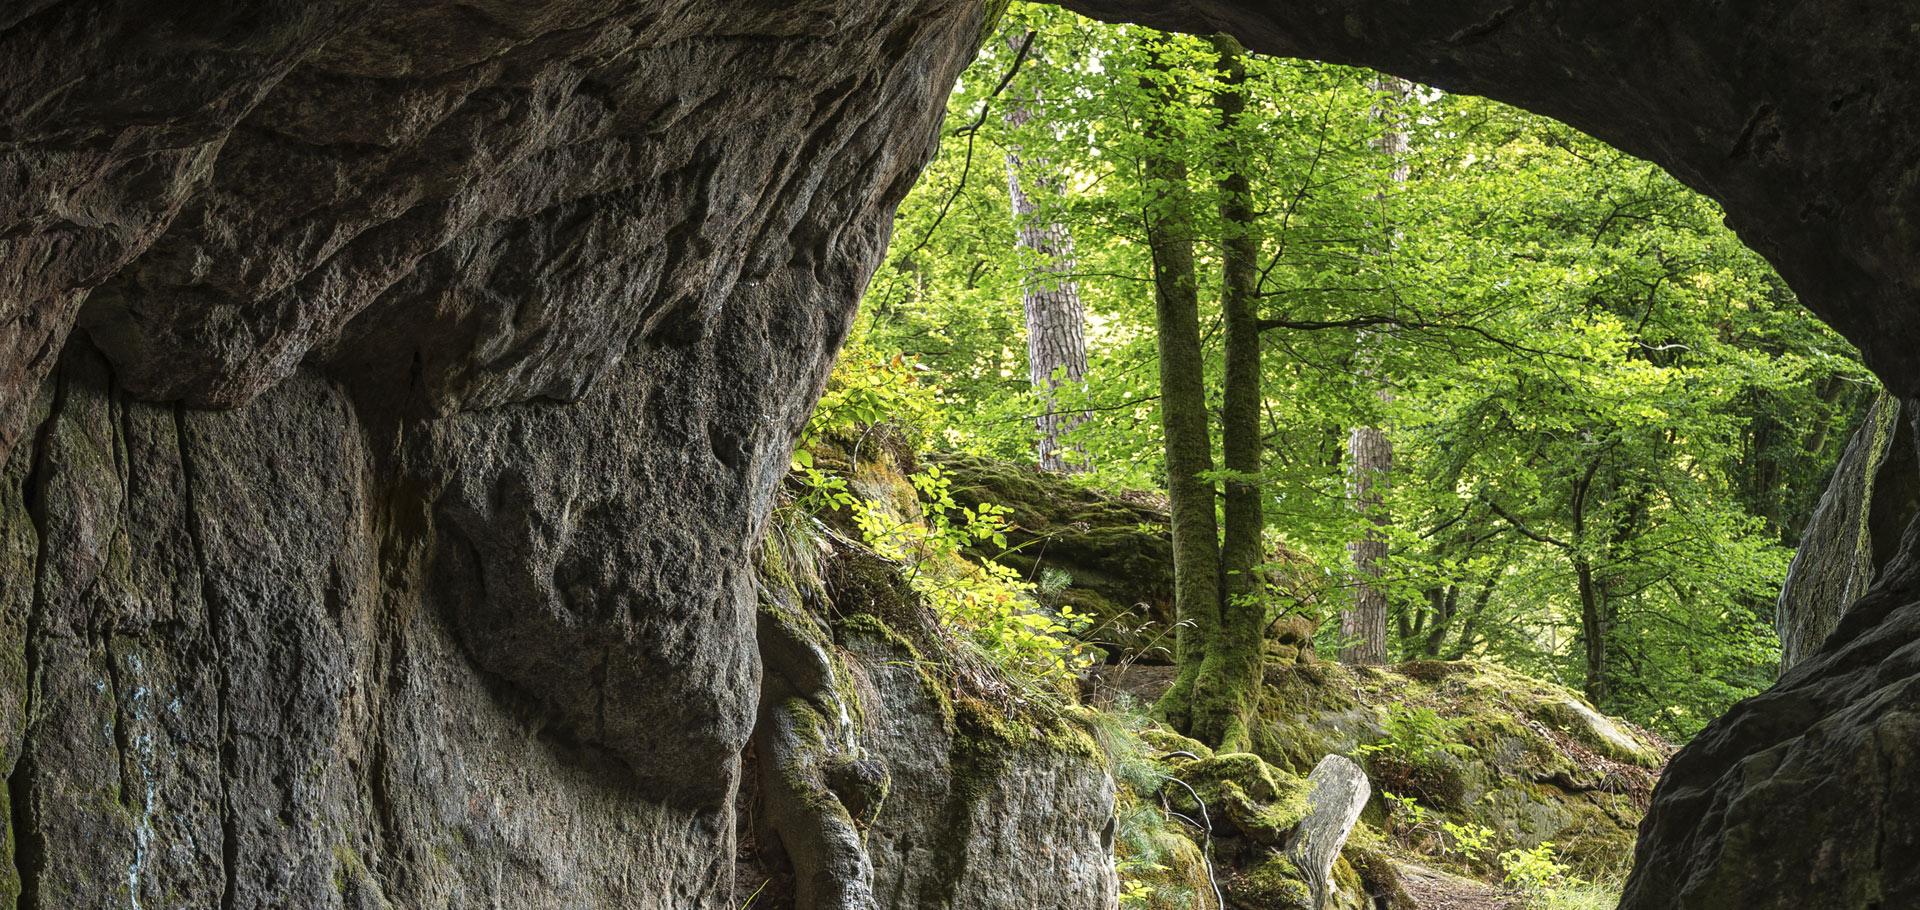 Camping_Martbusch_Berdorf_Luxemburg_Wandern_03